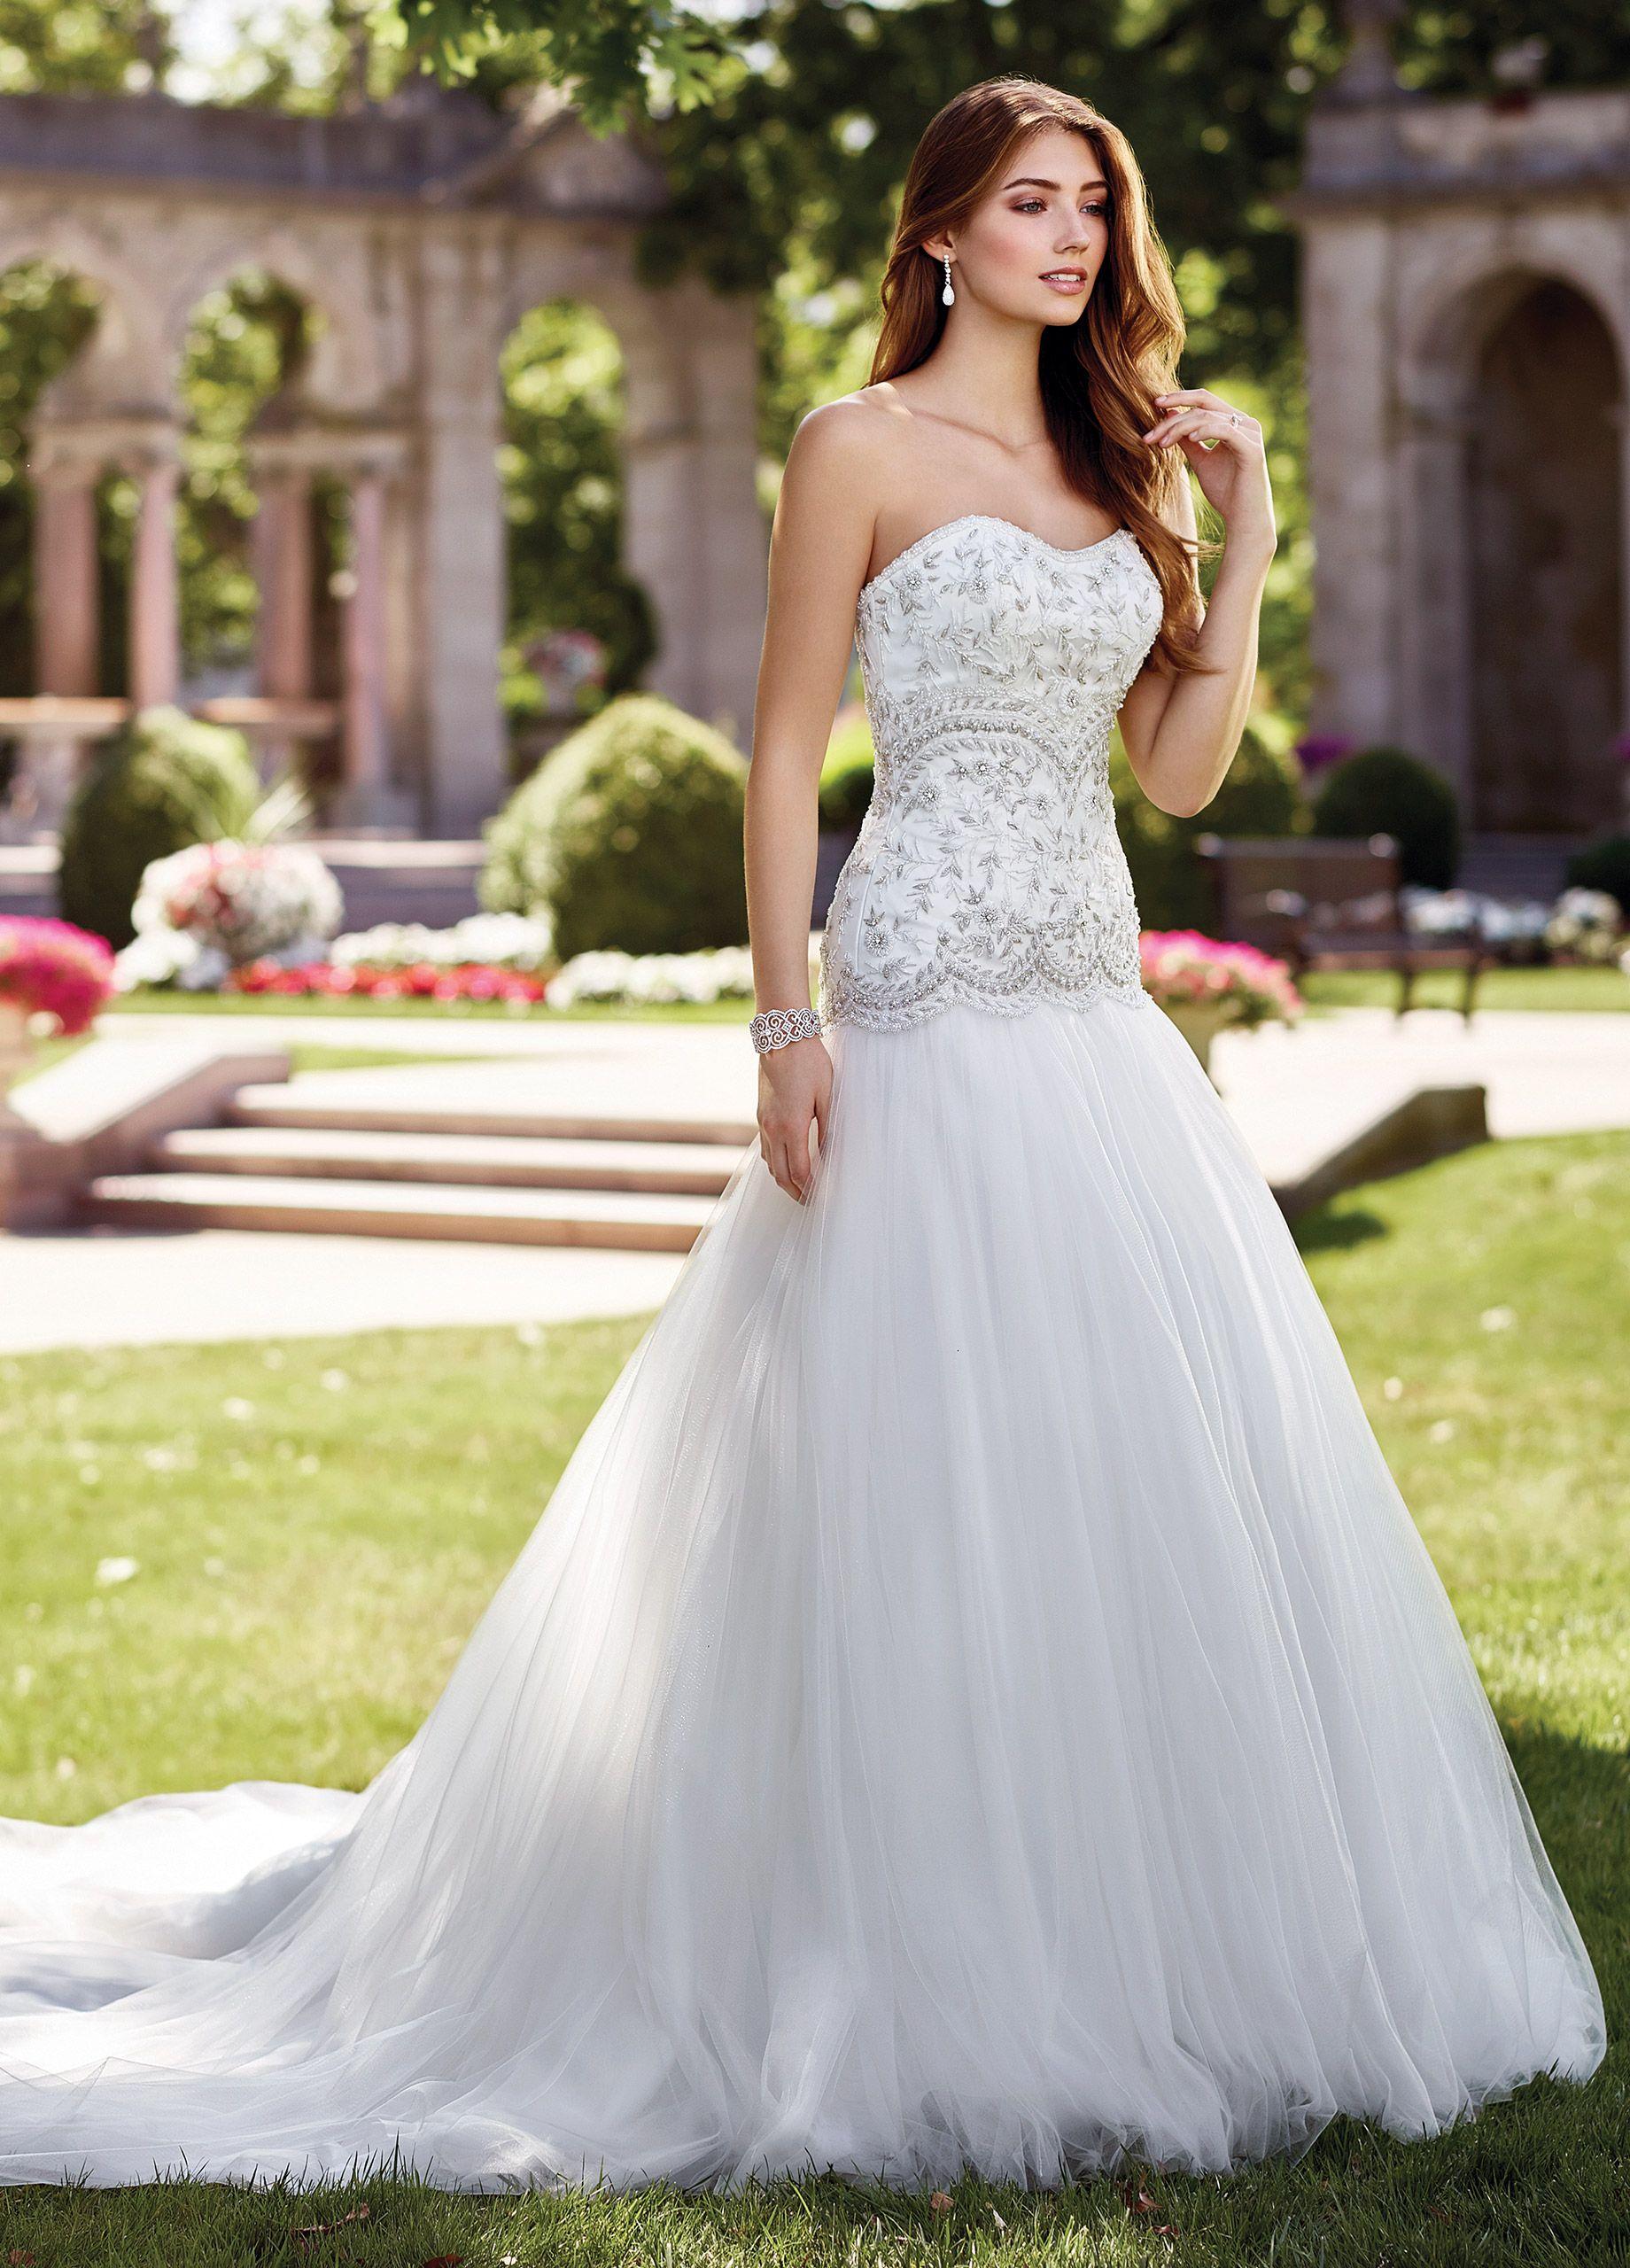 Detachable skirt wedding dress  Intricate HandBeaded Aline Wedding Dress  Nudara  Wedding